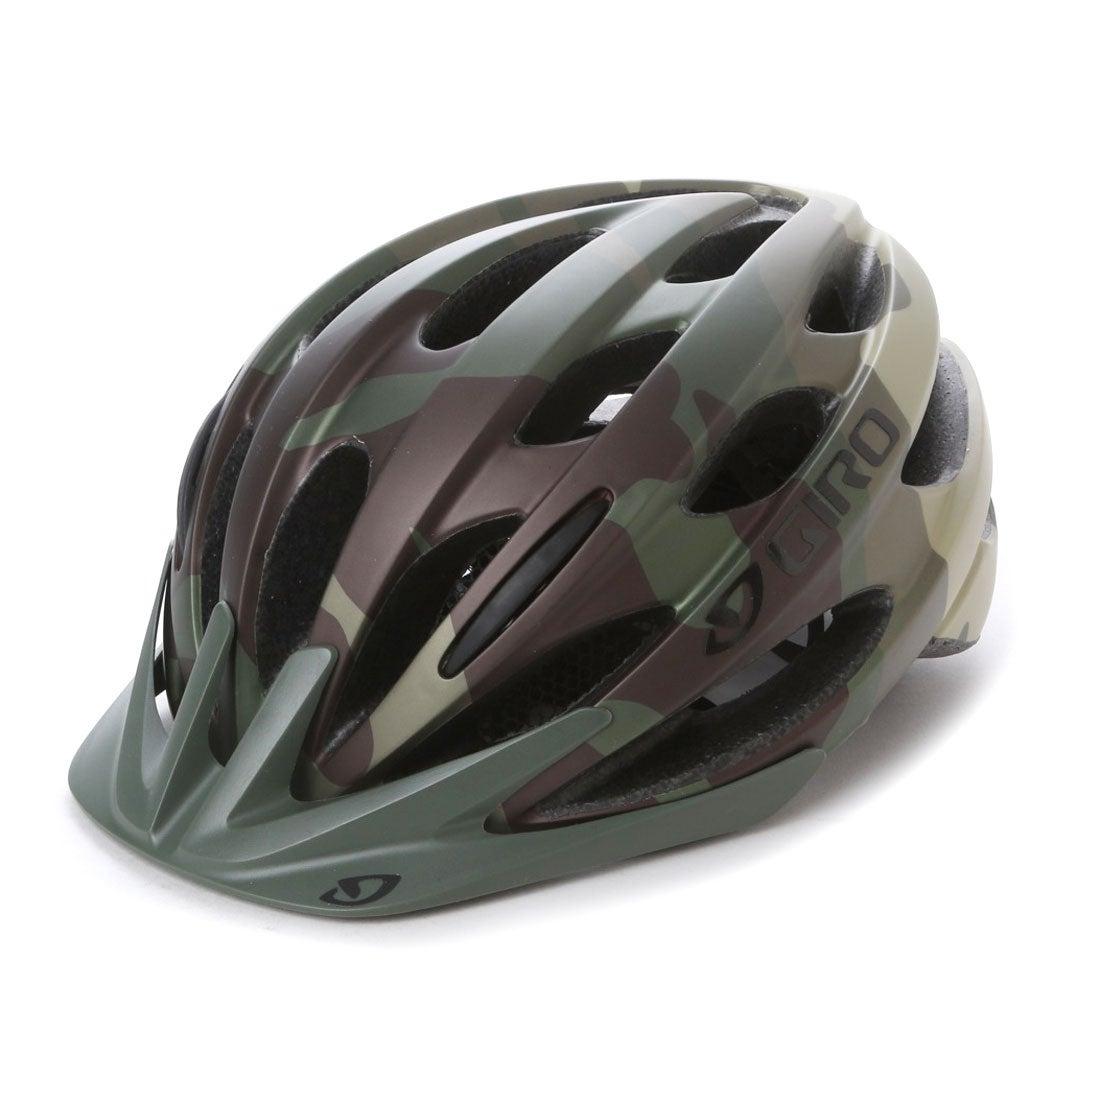 Giro Revel Sport Helmet Helmzubehör Helme & Protektoren